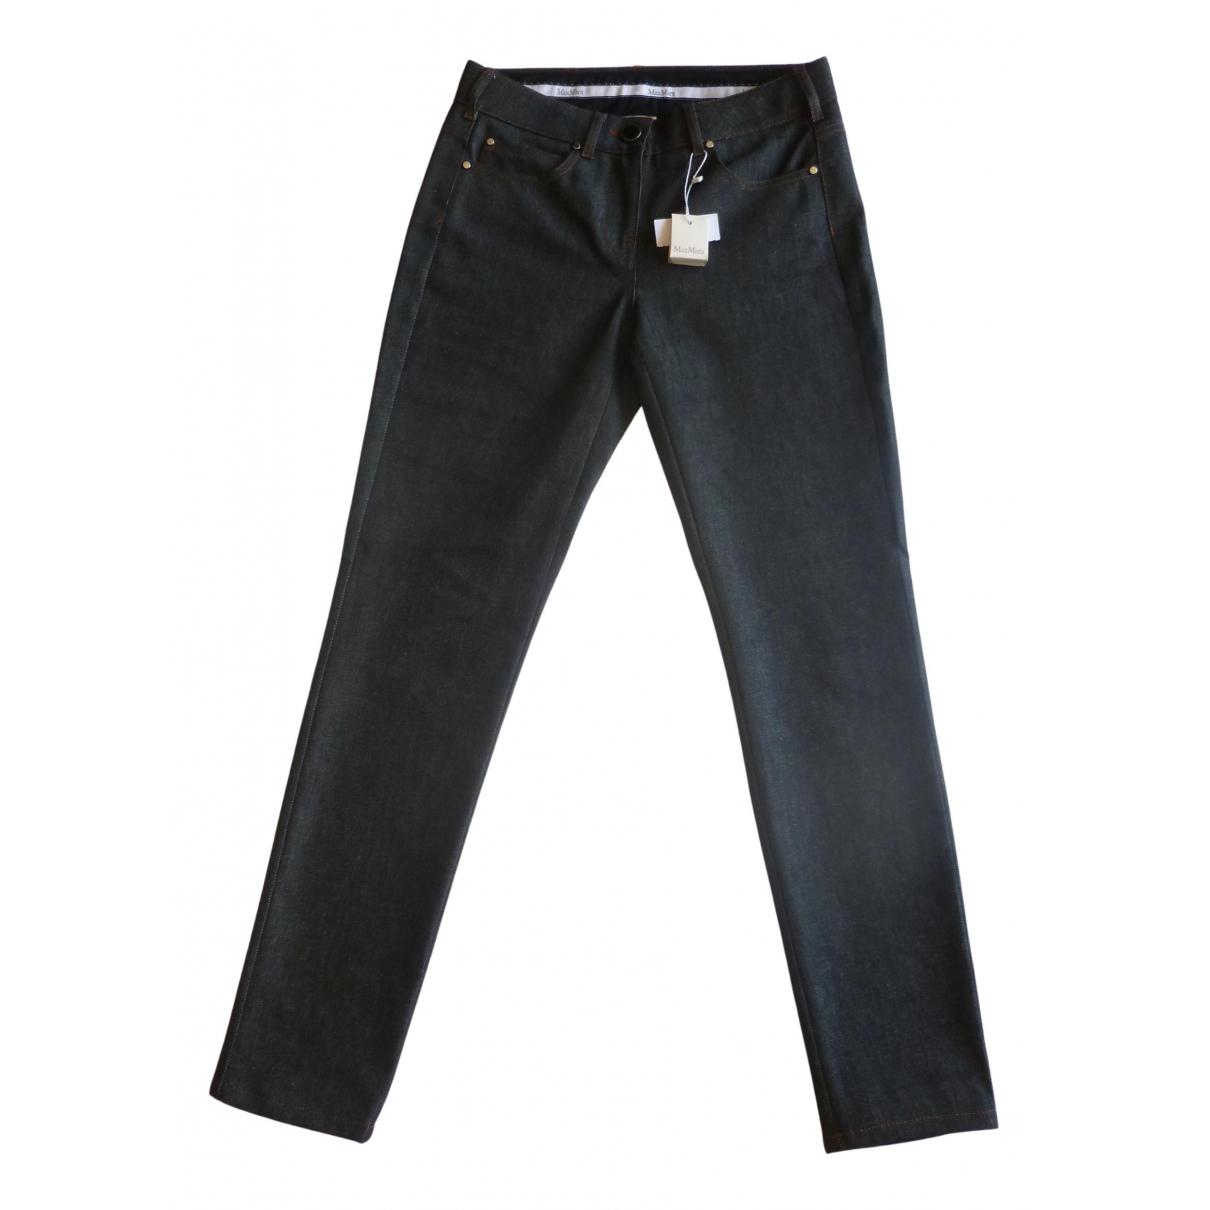 Max Mara N Black Cotton - elasthane Jeans for Women 36 FR